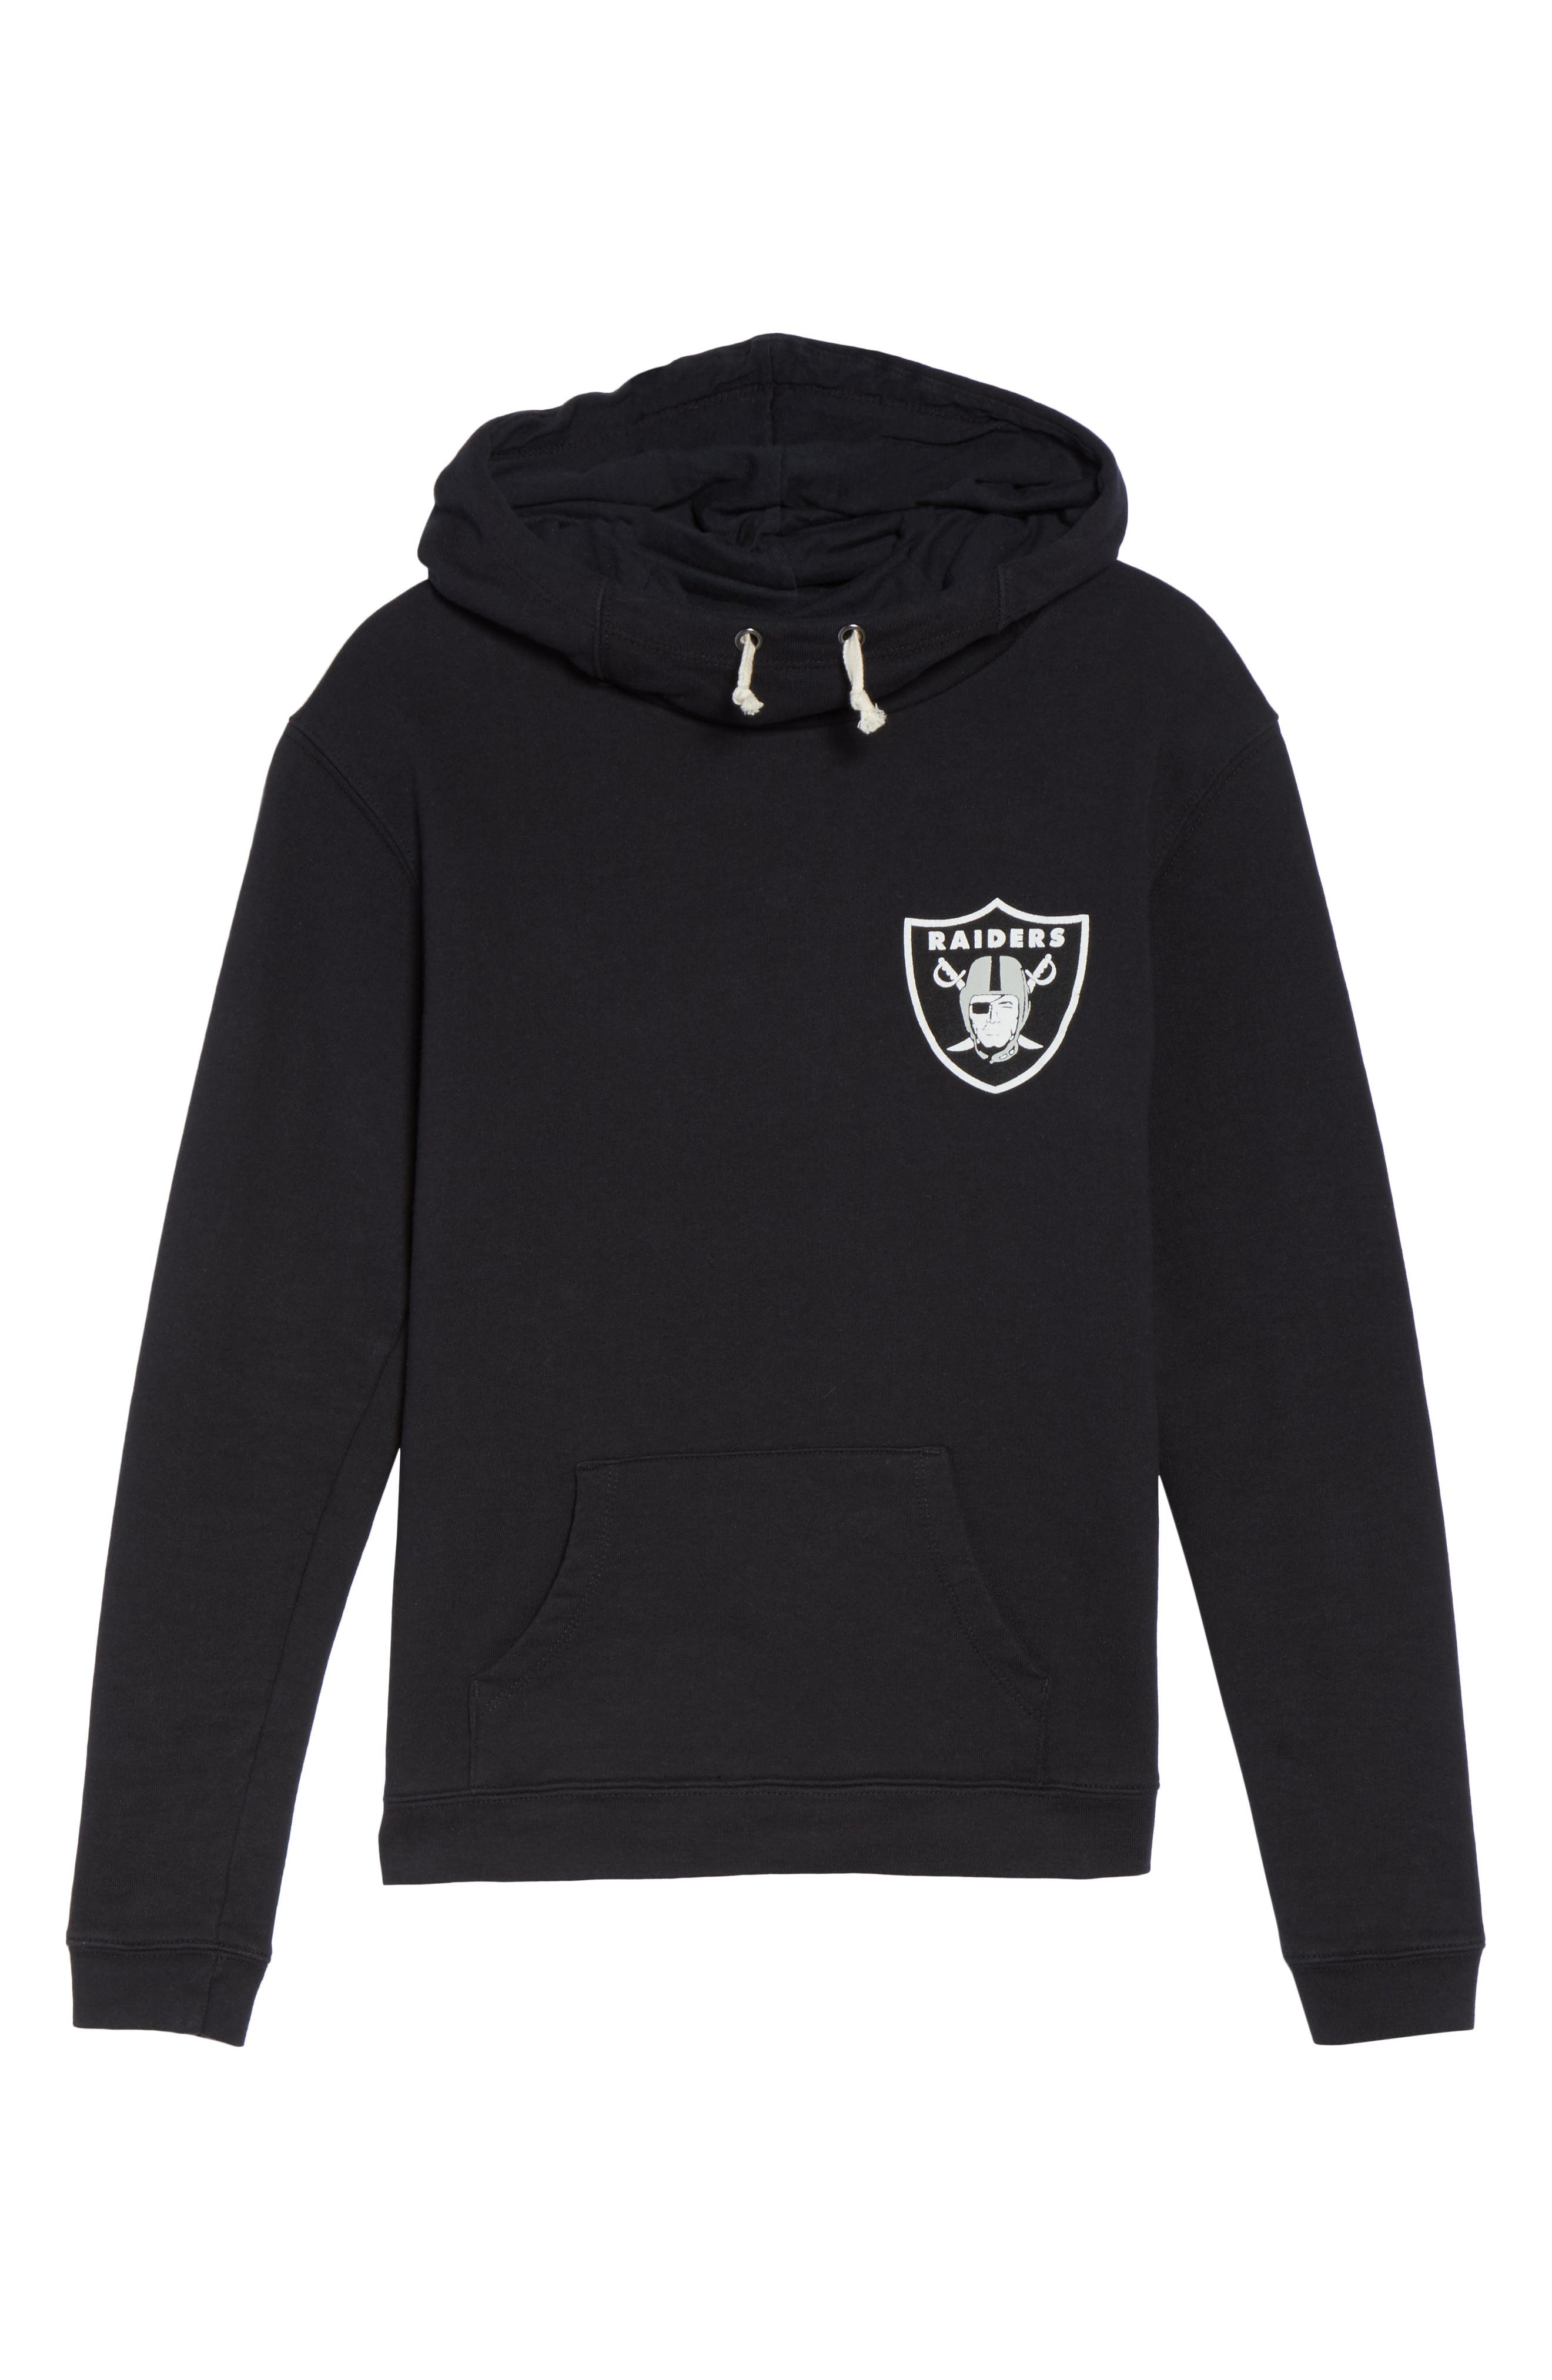 NFL Oakland Raiders Sunday Hoodie,                             Alternate thumbnail 6, color,                             001